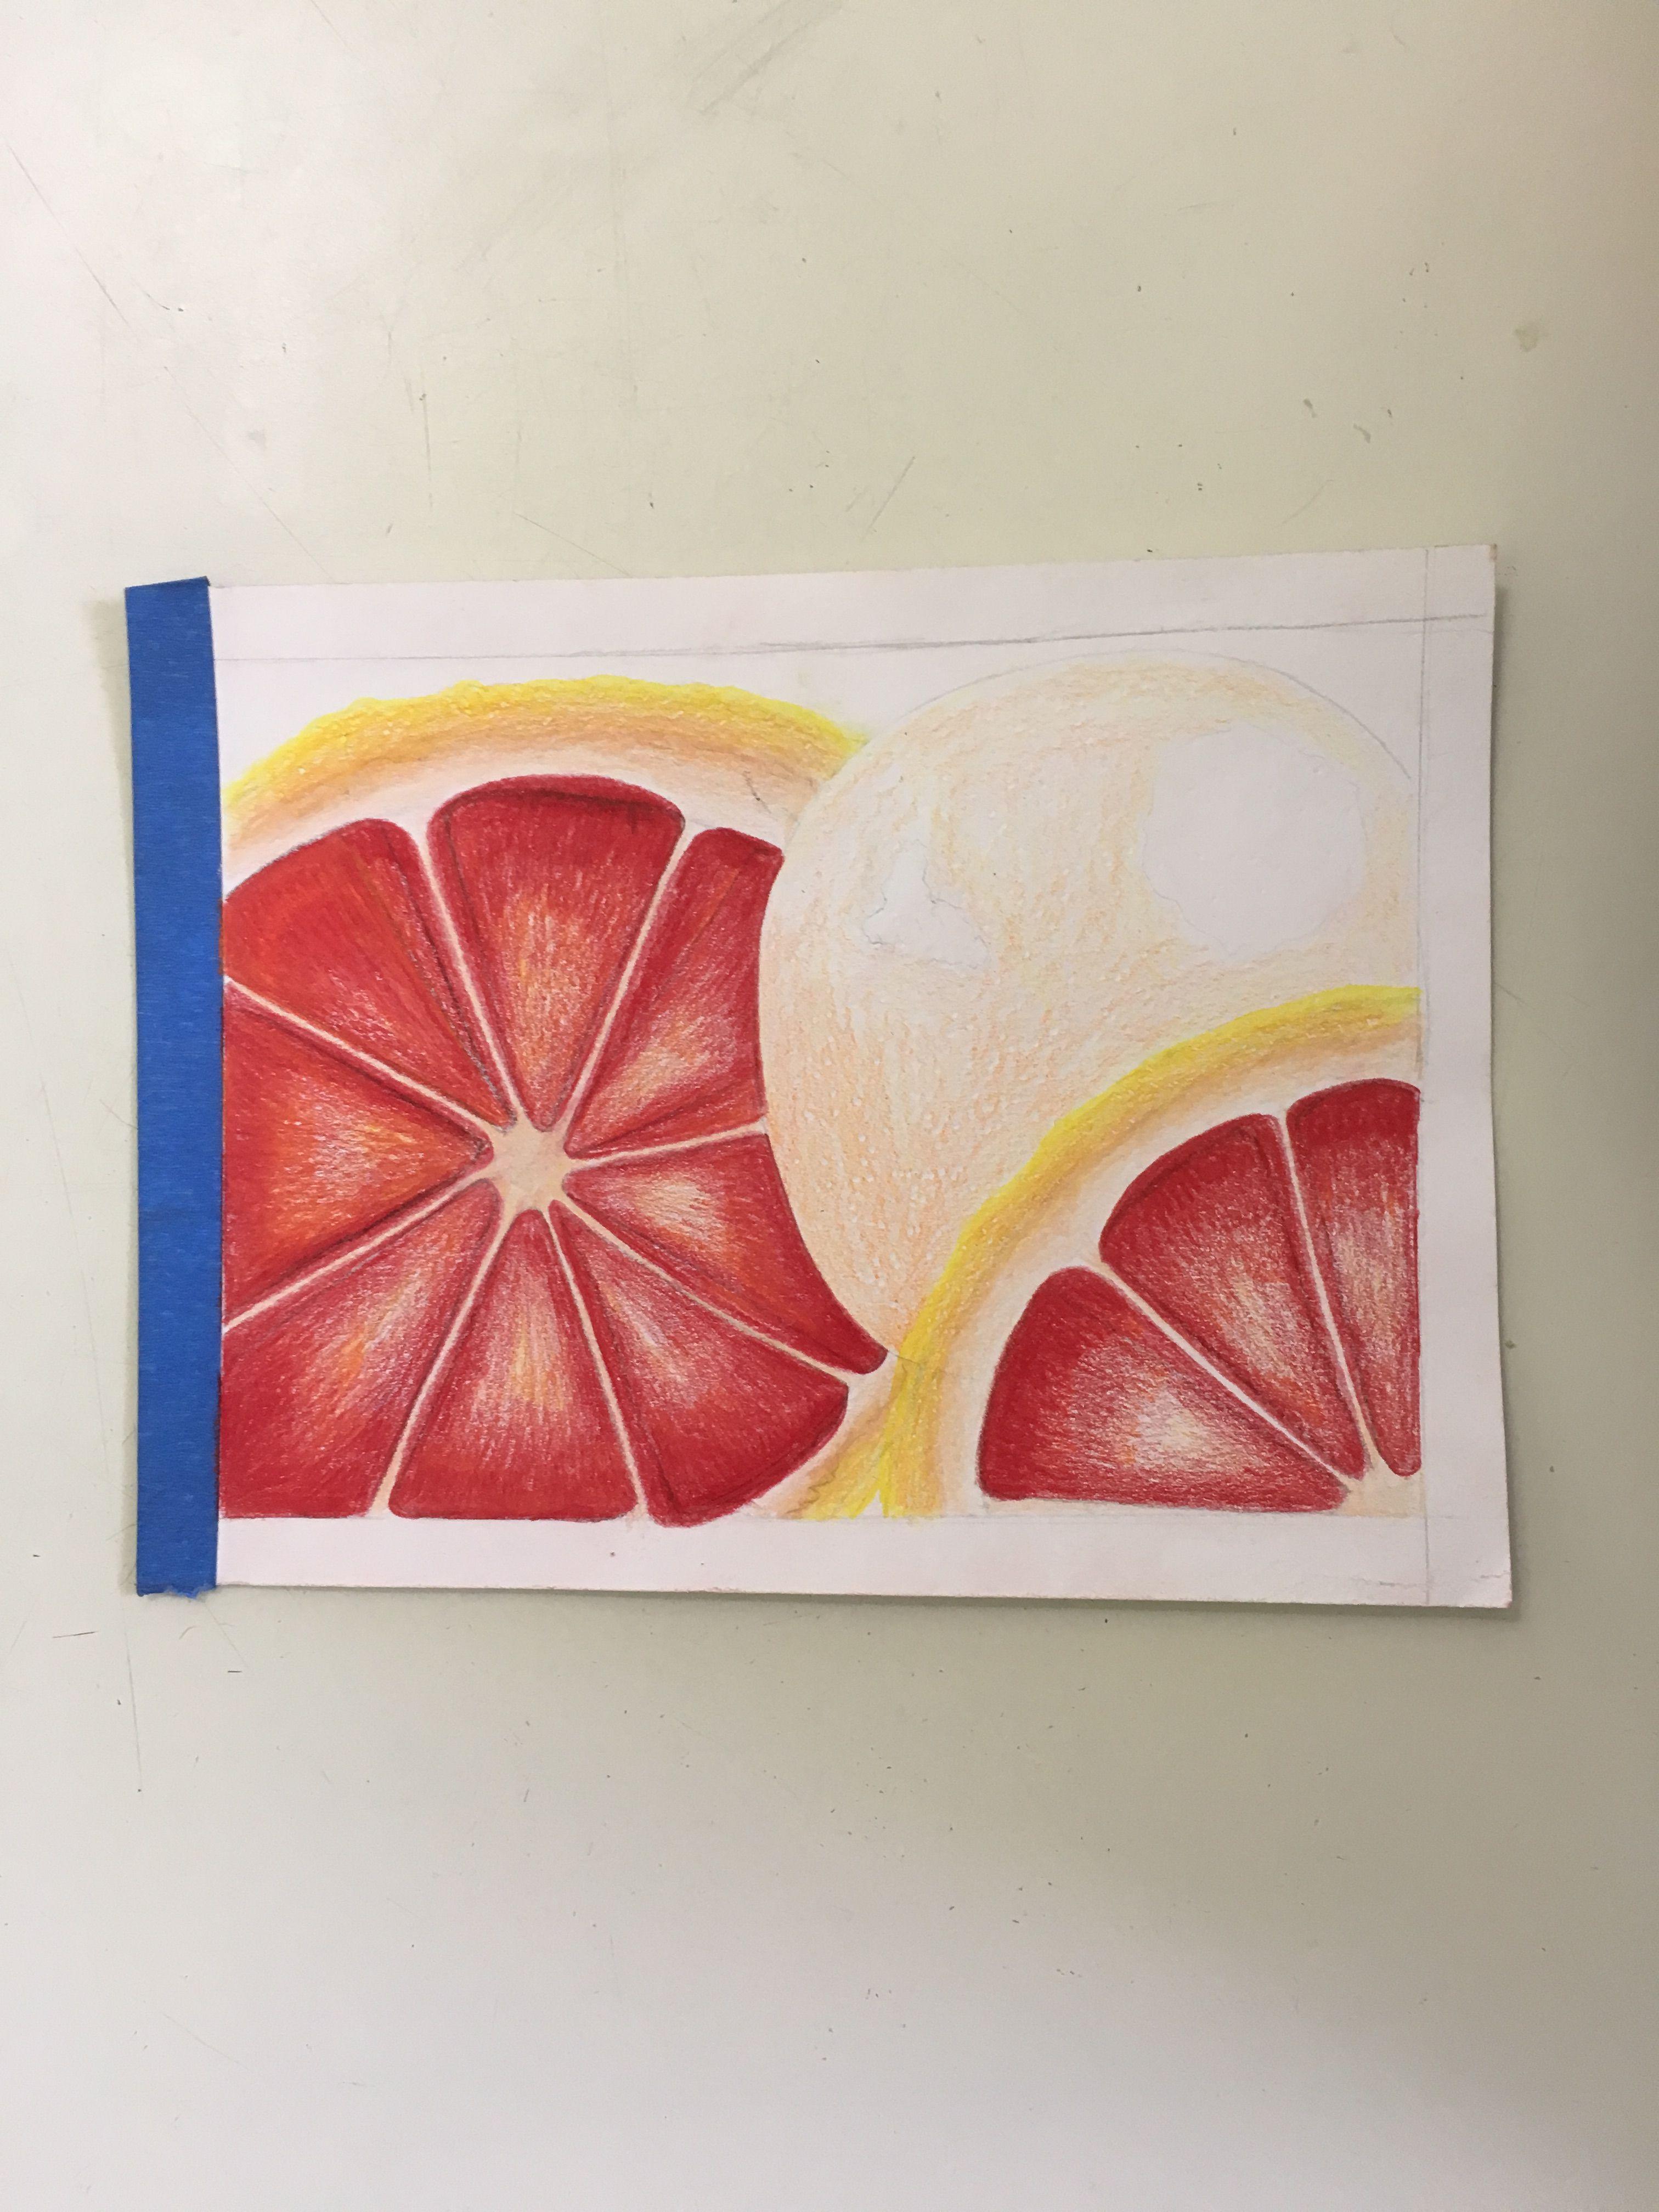 5/13/16 Fruit